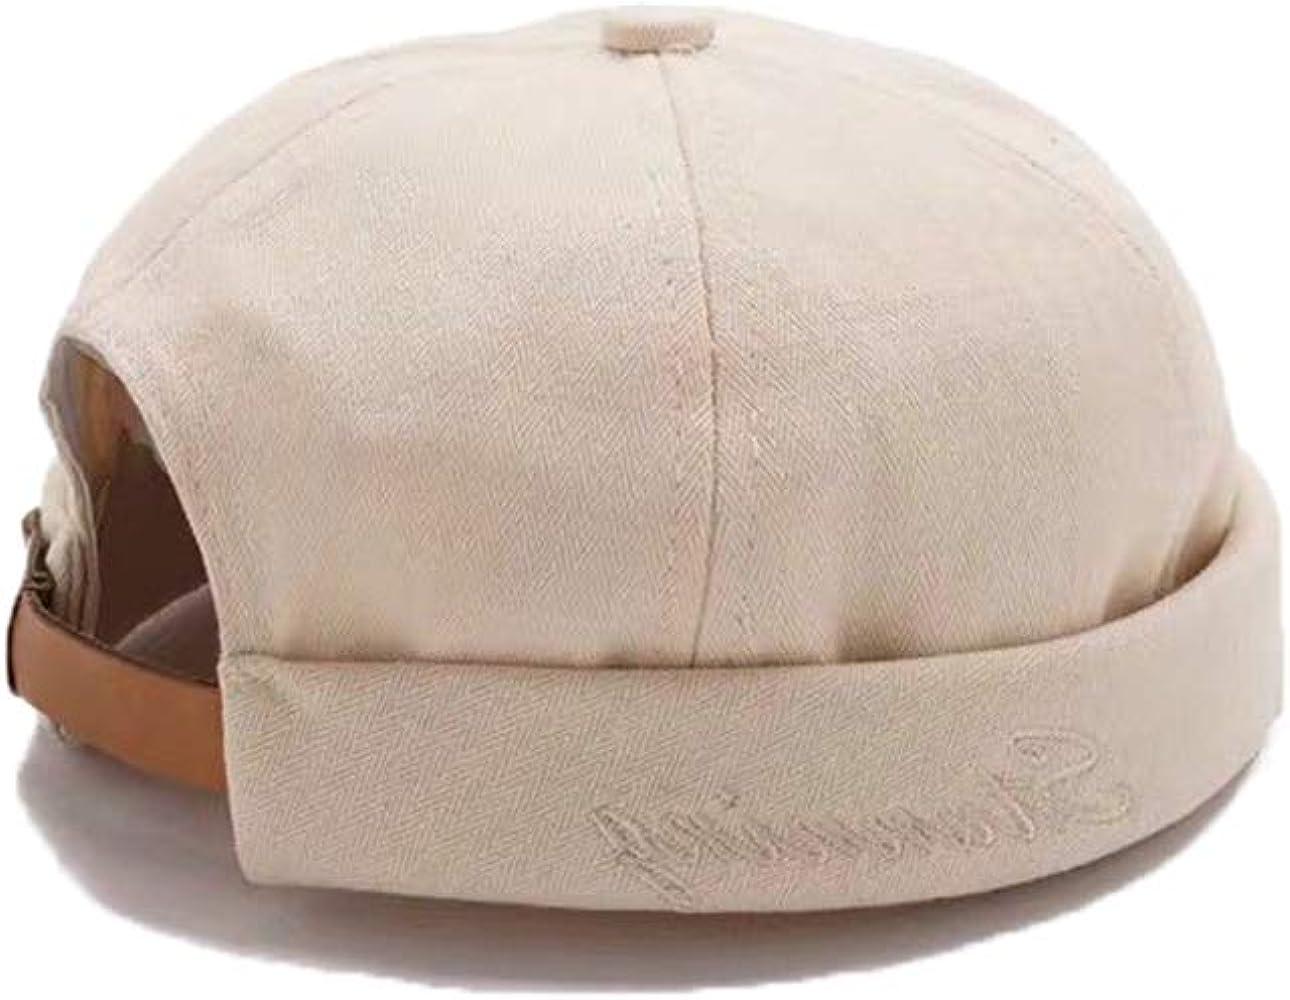 efc29cd1 Unisex Docker Brimless Hats Skullcap Beanie Worker Sailor Cap Retro Rolled  Cuff Skull Caps with Adjustable